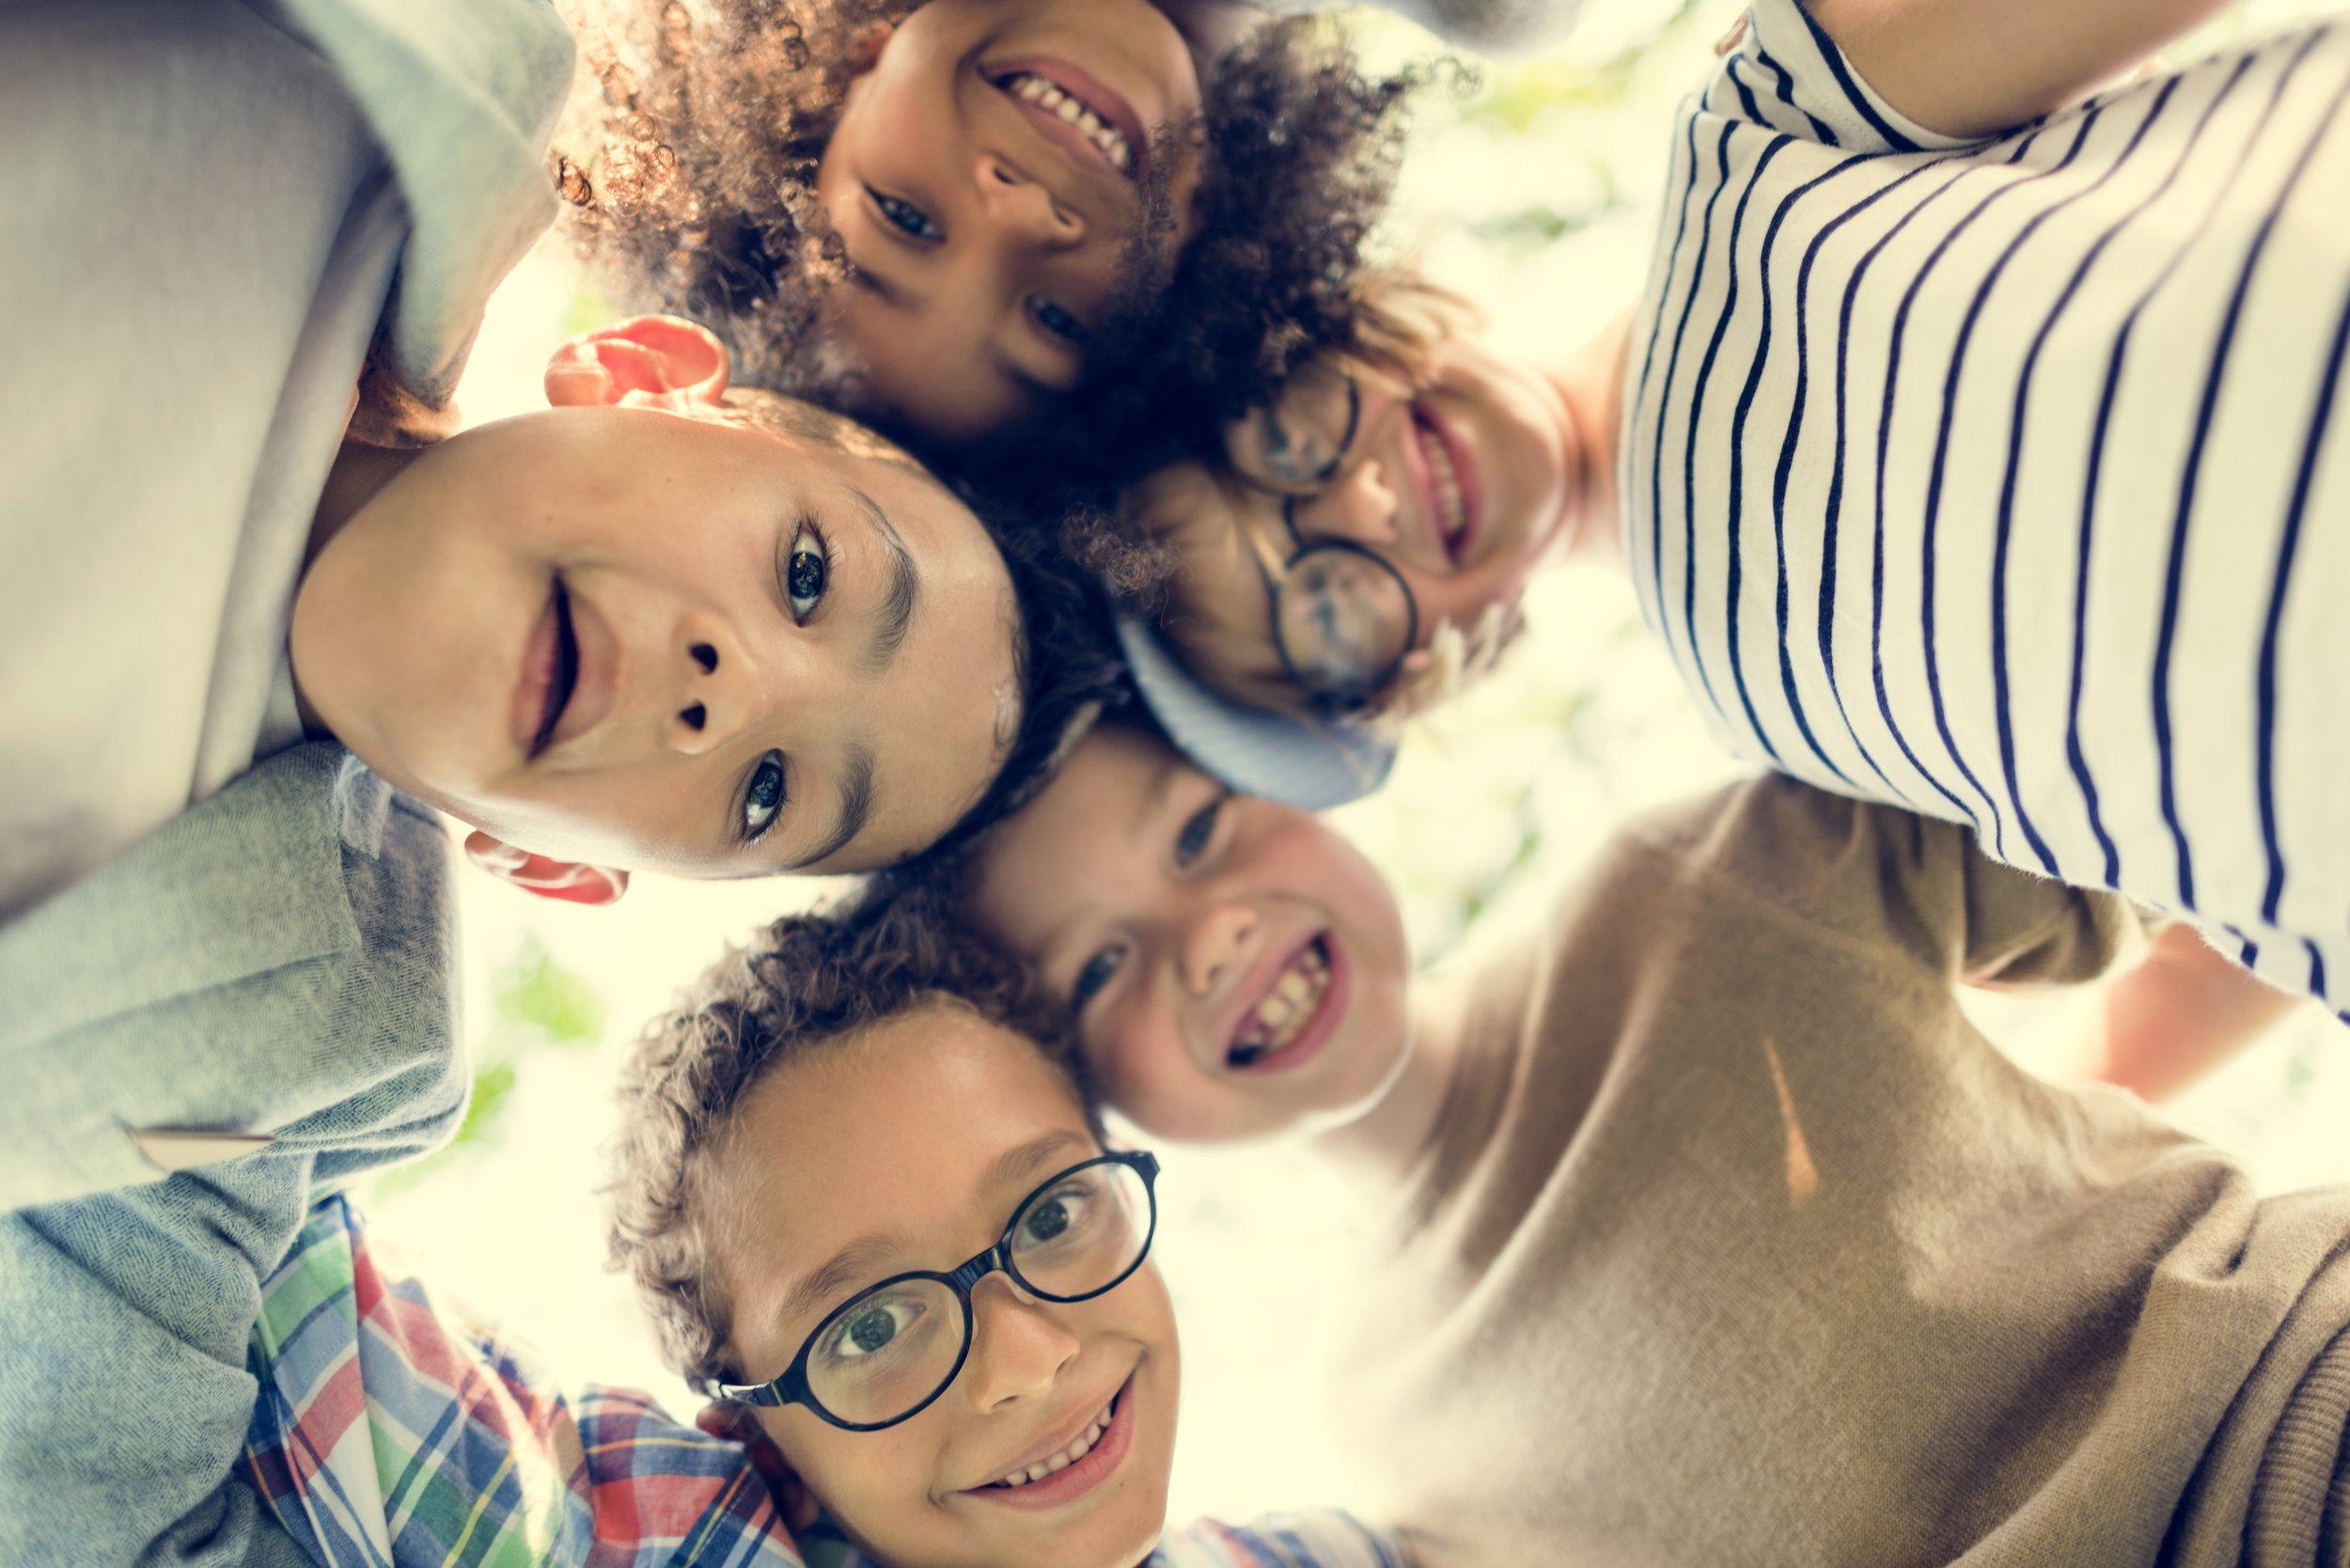 casual-children-cheerful-cute-friends-kids-P5Z3DS4.jpg